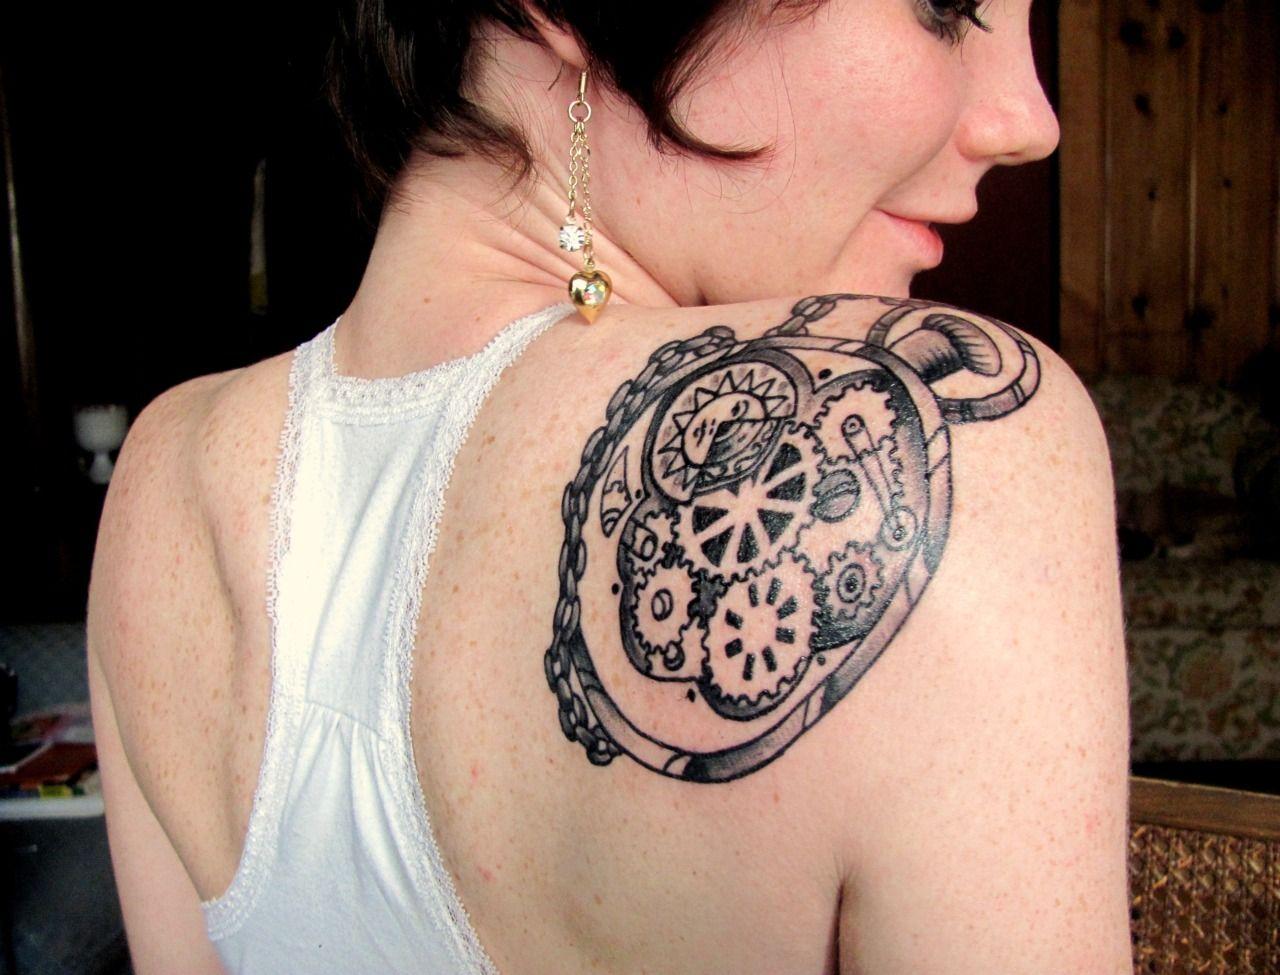 pocket watch tattoo on the shoulder watch tattoo stuff i like pinterest. Black Bedroom Furniture Sets. Home Design Ideas